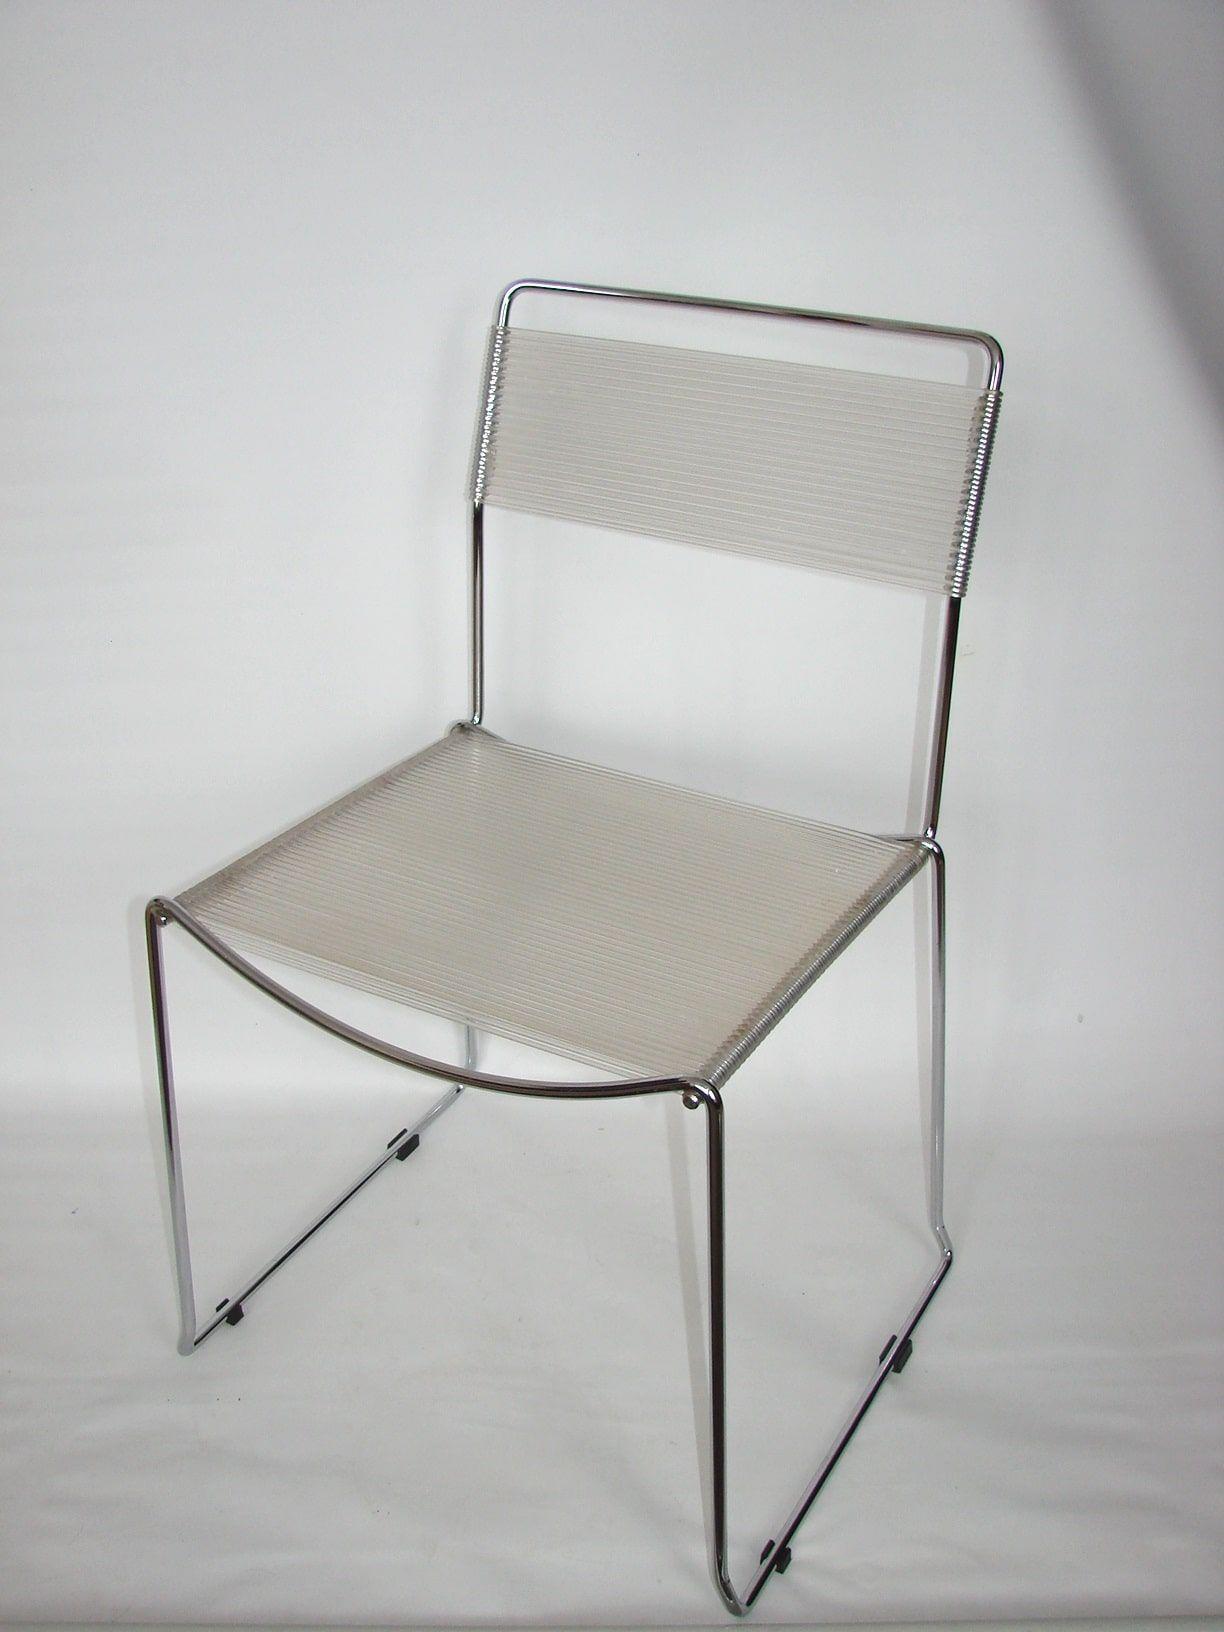 44 Best Krzesła metalowe | Metal chairs images | Chairs